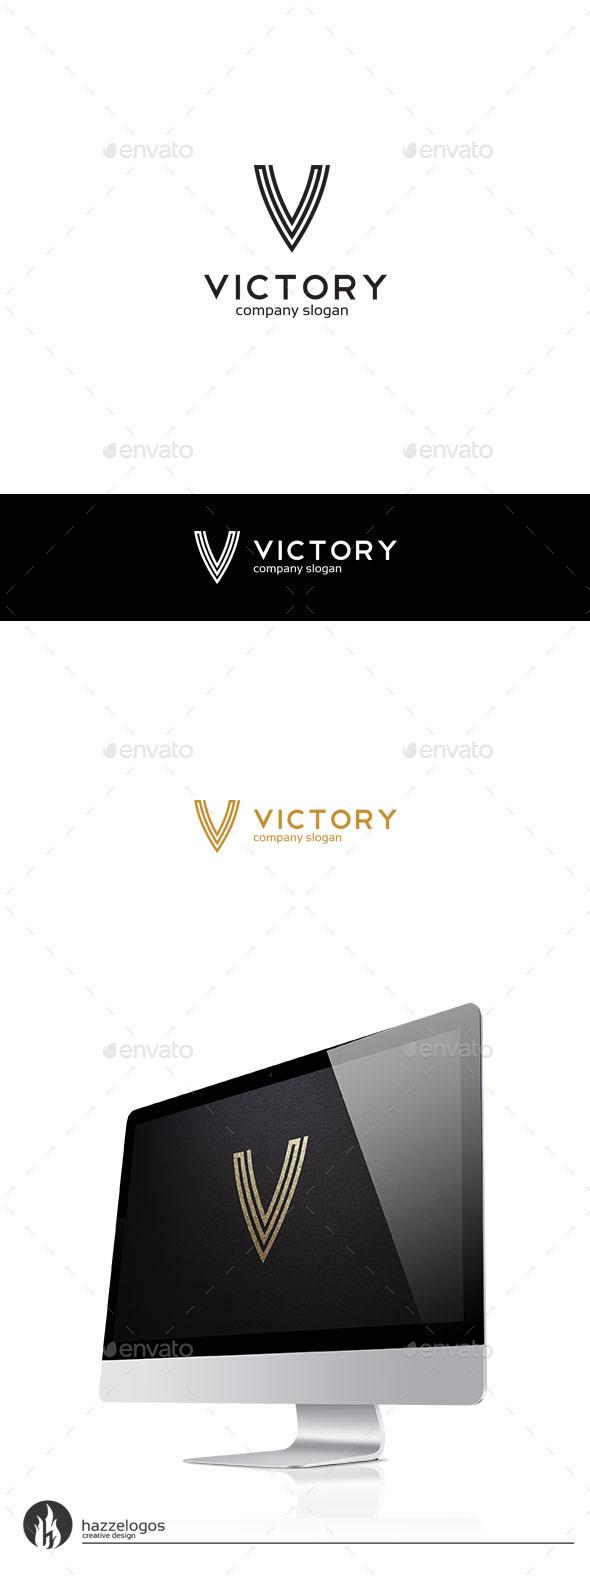 GraphicRiver Victory Logo 9944812